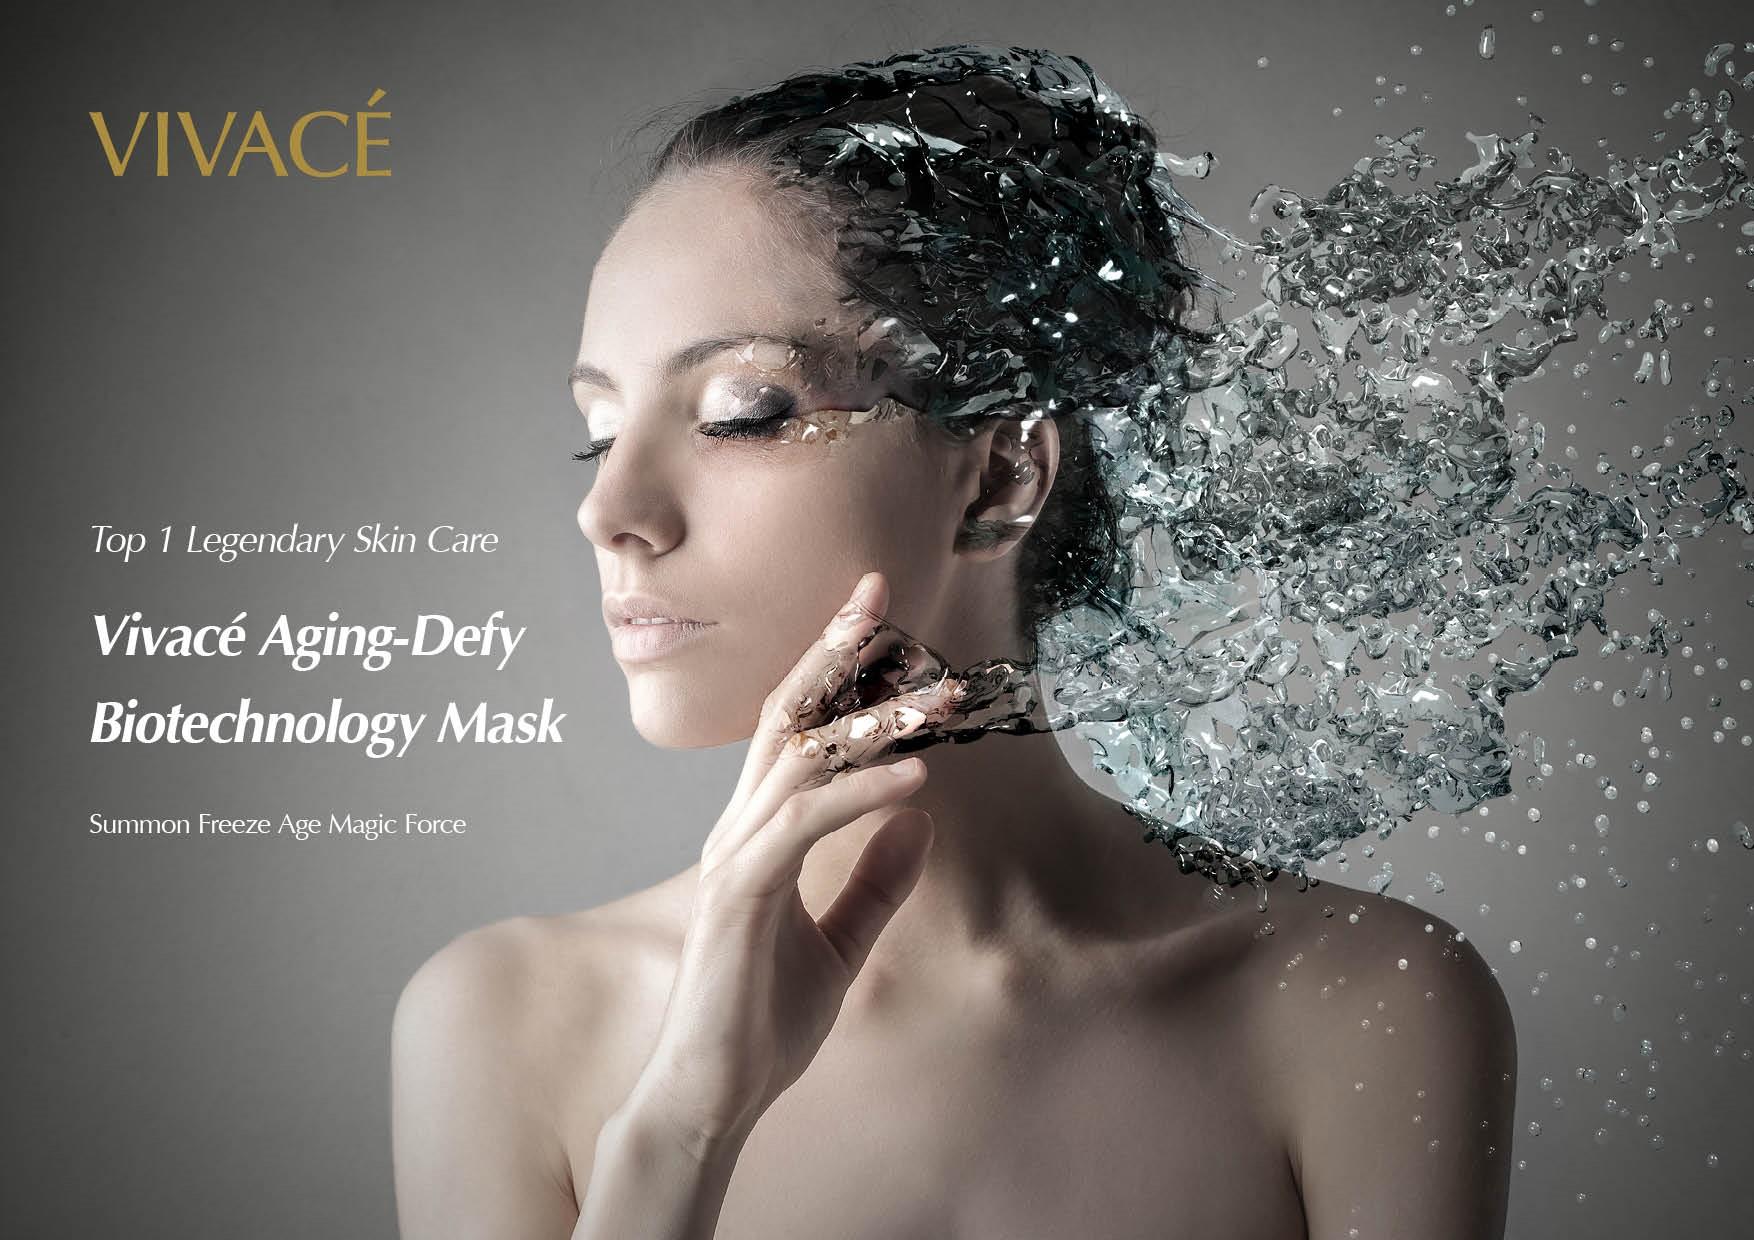 mask facial Scheming beauty